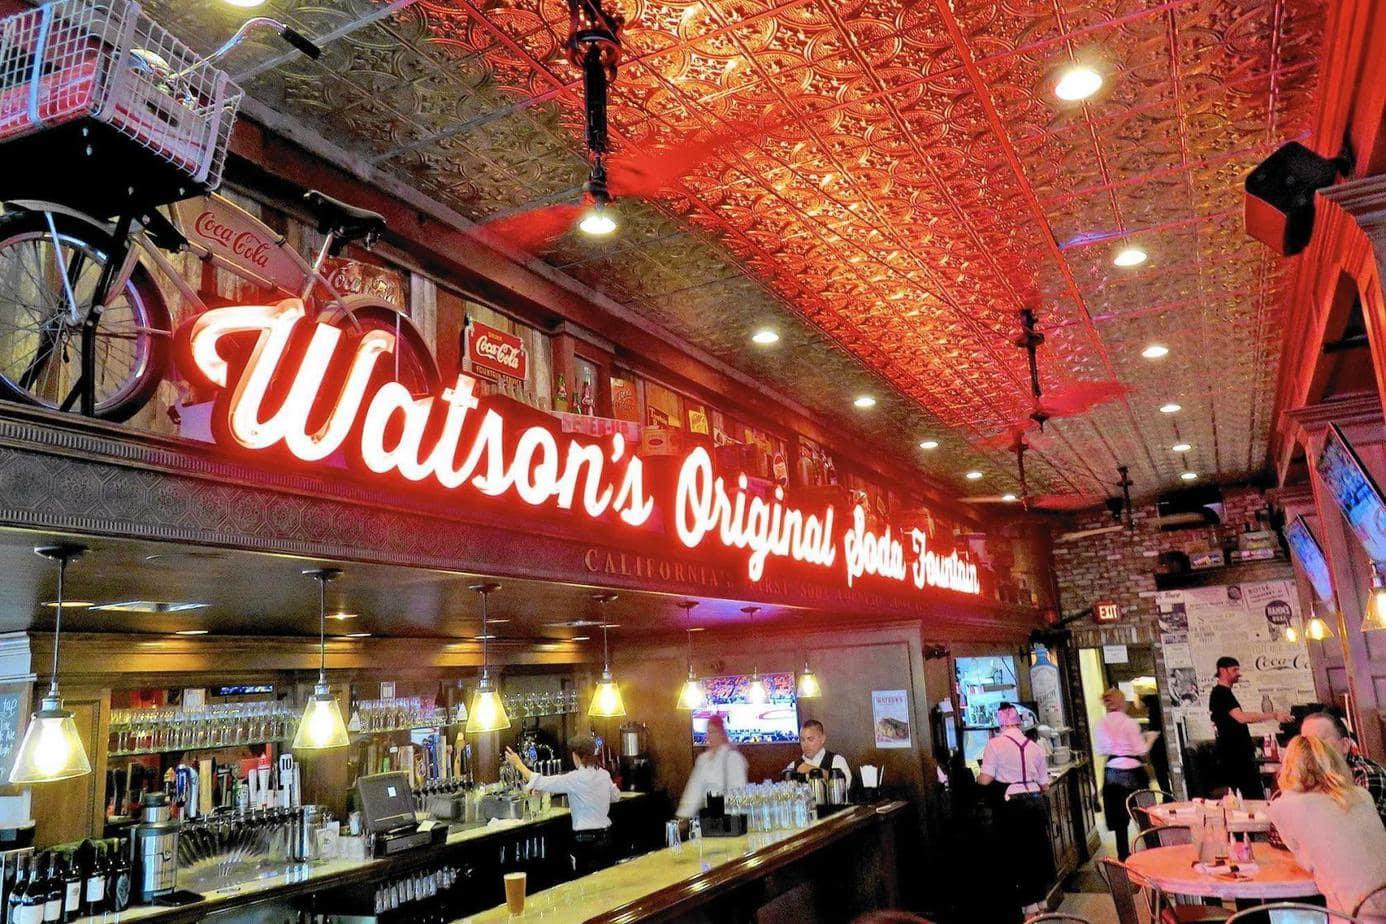 Watson's Soda Fountain & Cafe